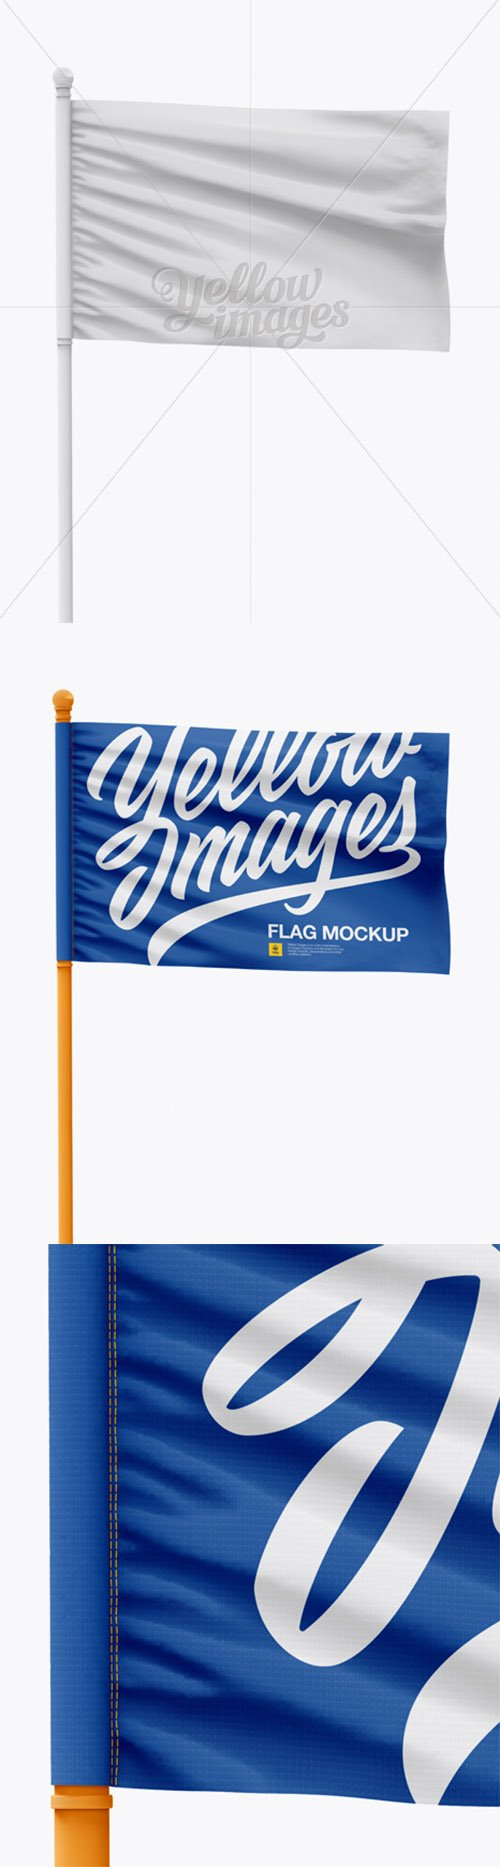 Flag Mockup - Front View 18390 TIF